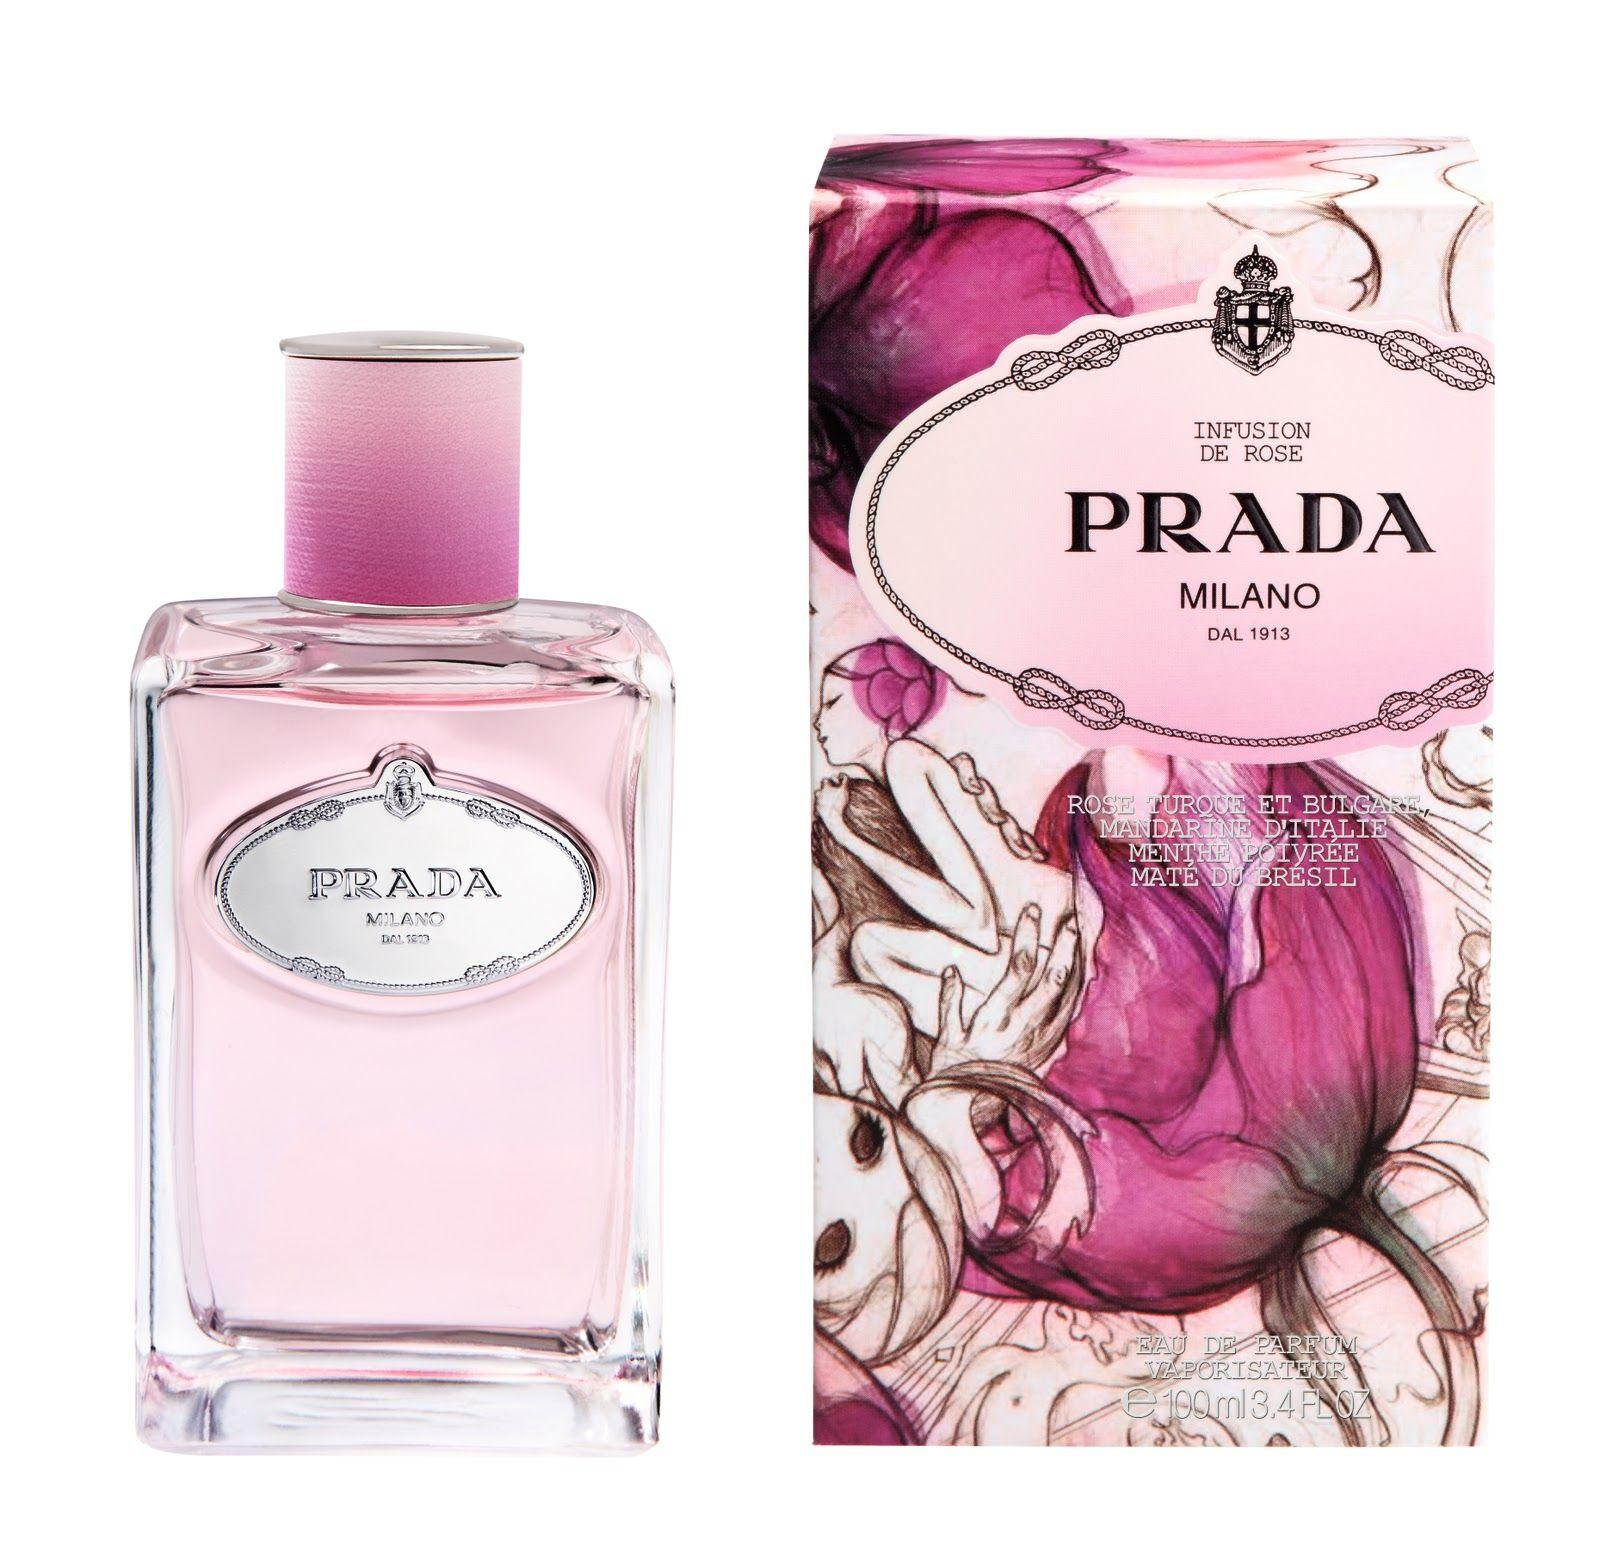 Algunos Famosos Man Repellers Aka Modas Que Repelen Hombres Perfumes Frescos Botella De Perfume Perfume De Mujer